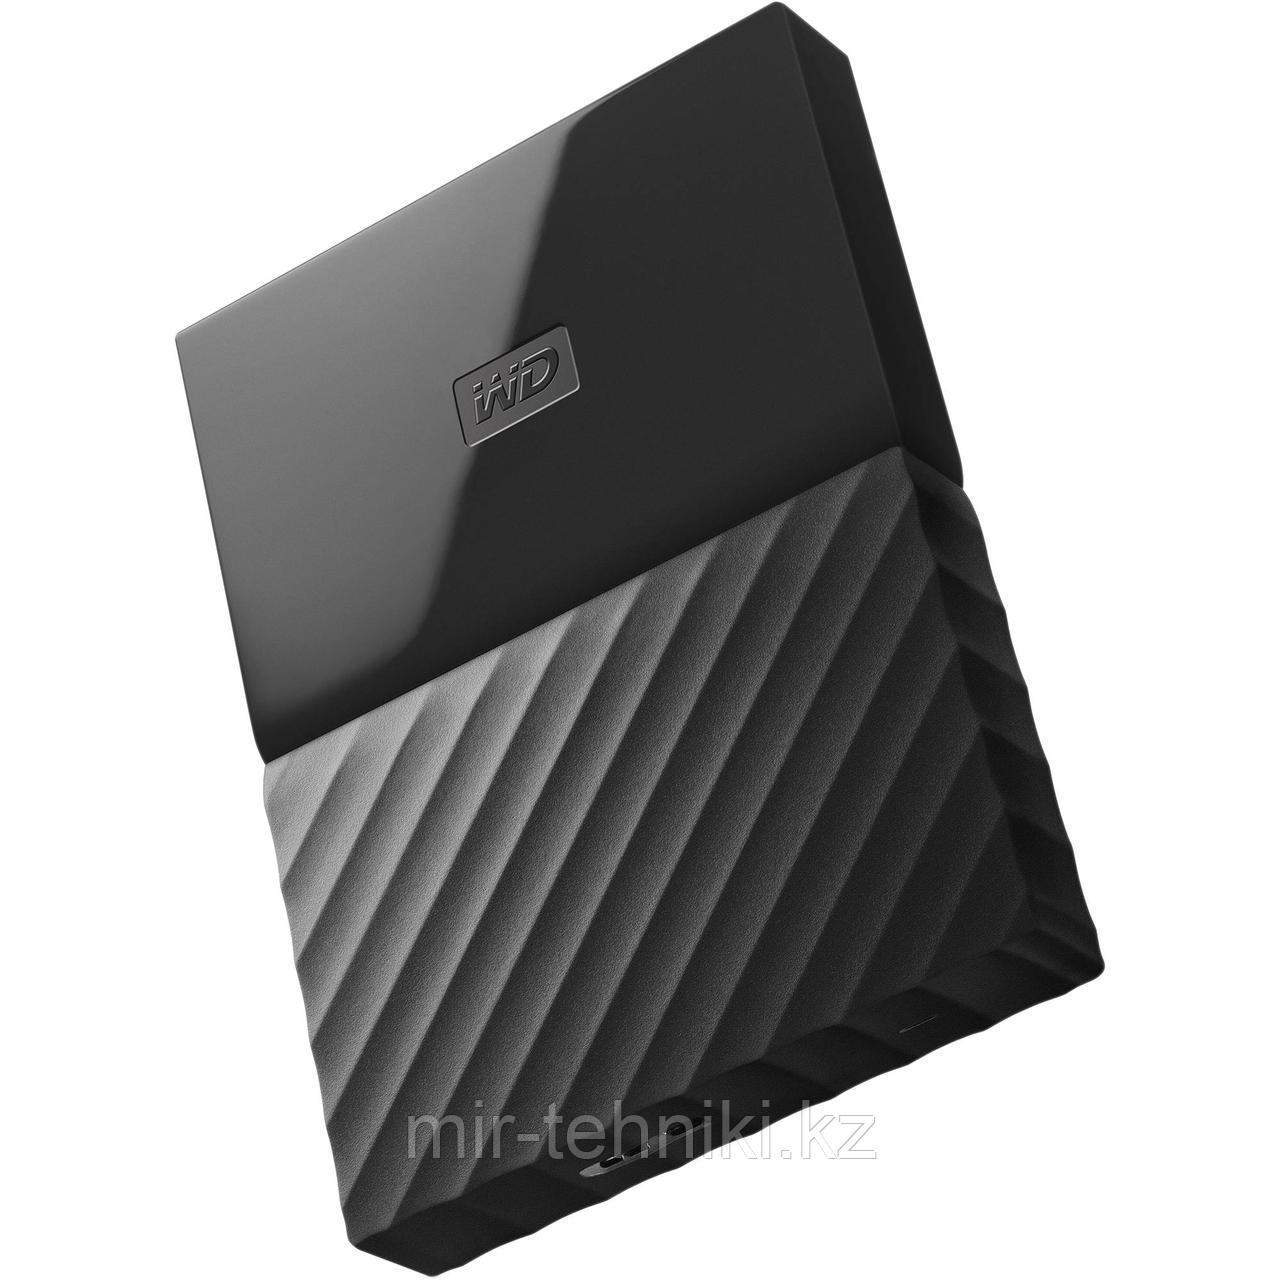 Внешний HDD  Wd my passport 1TB USB3.0 HARD DRIVE